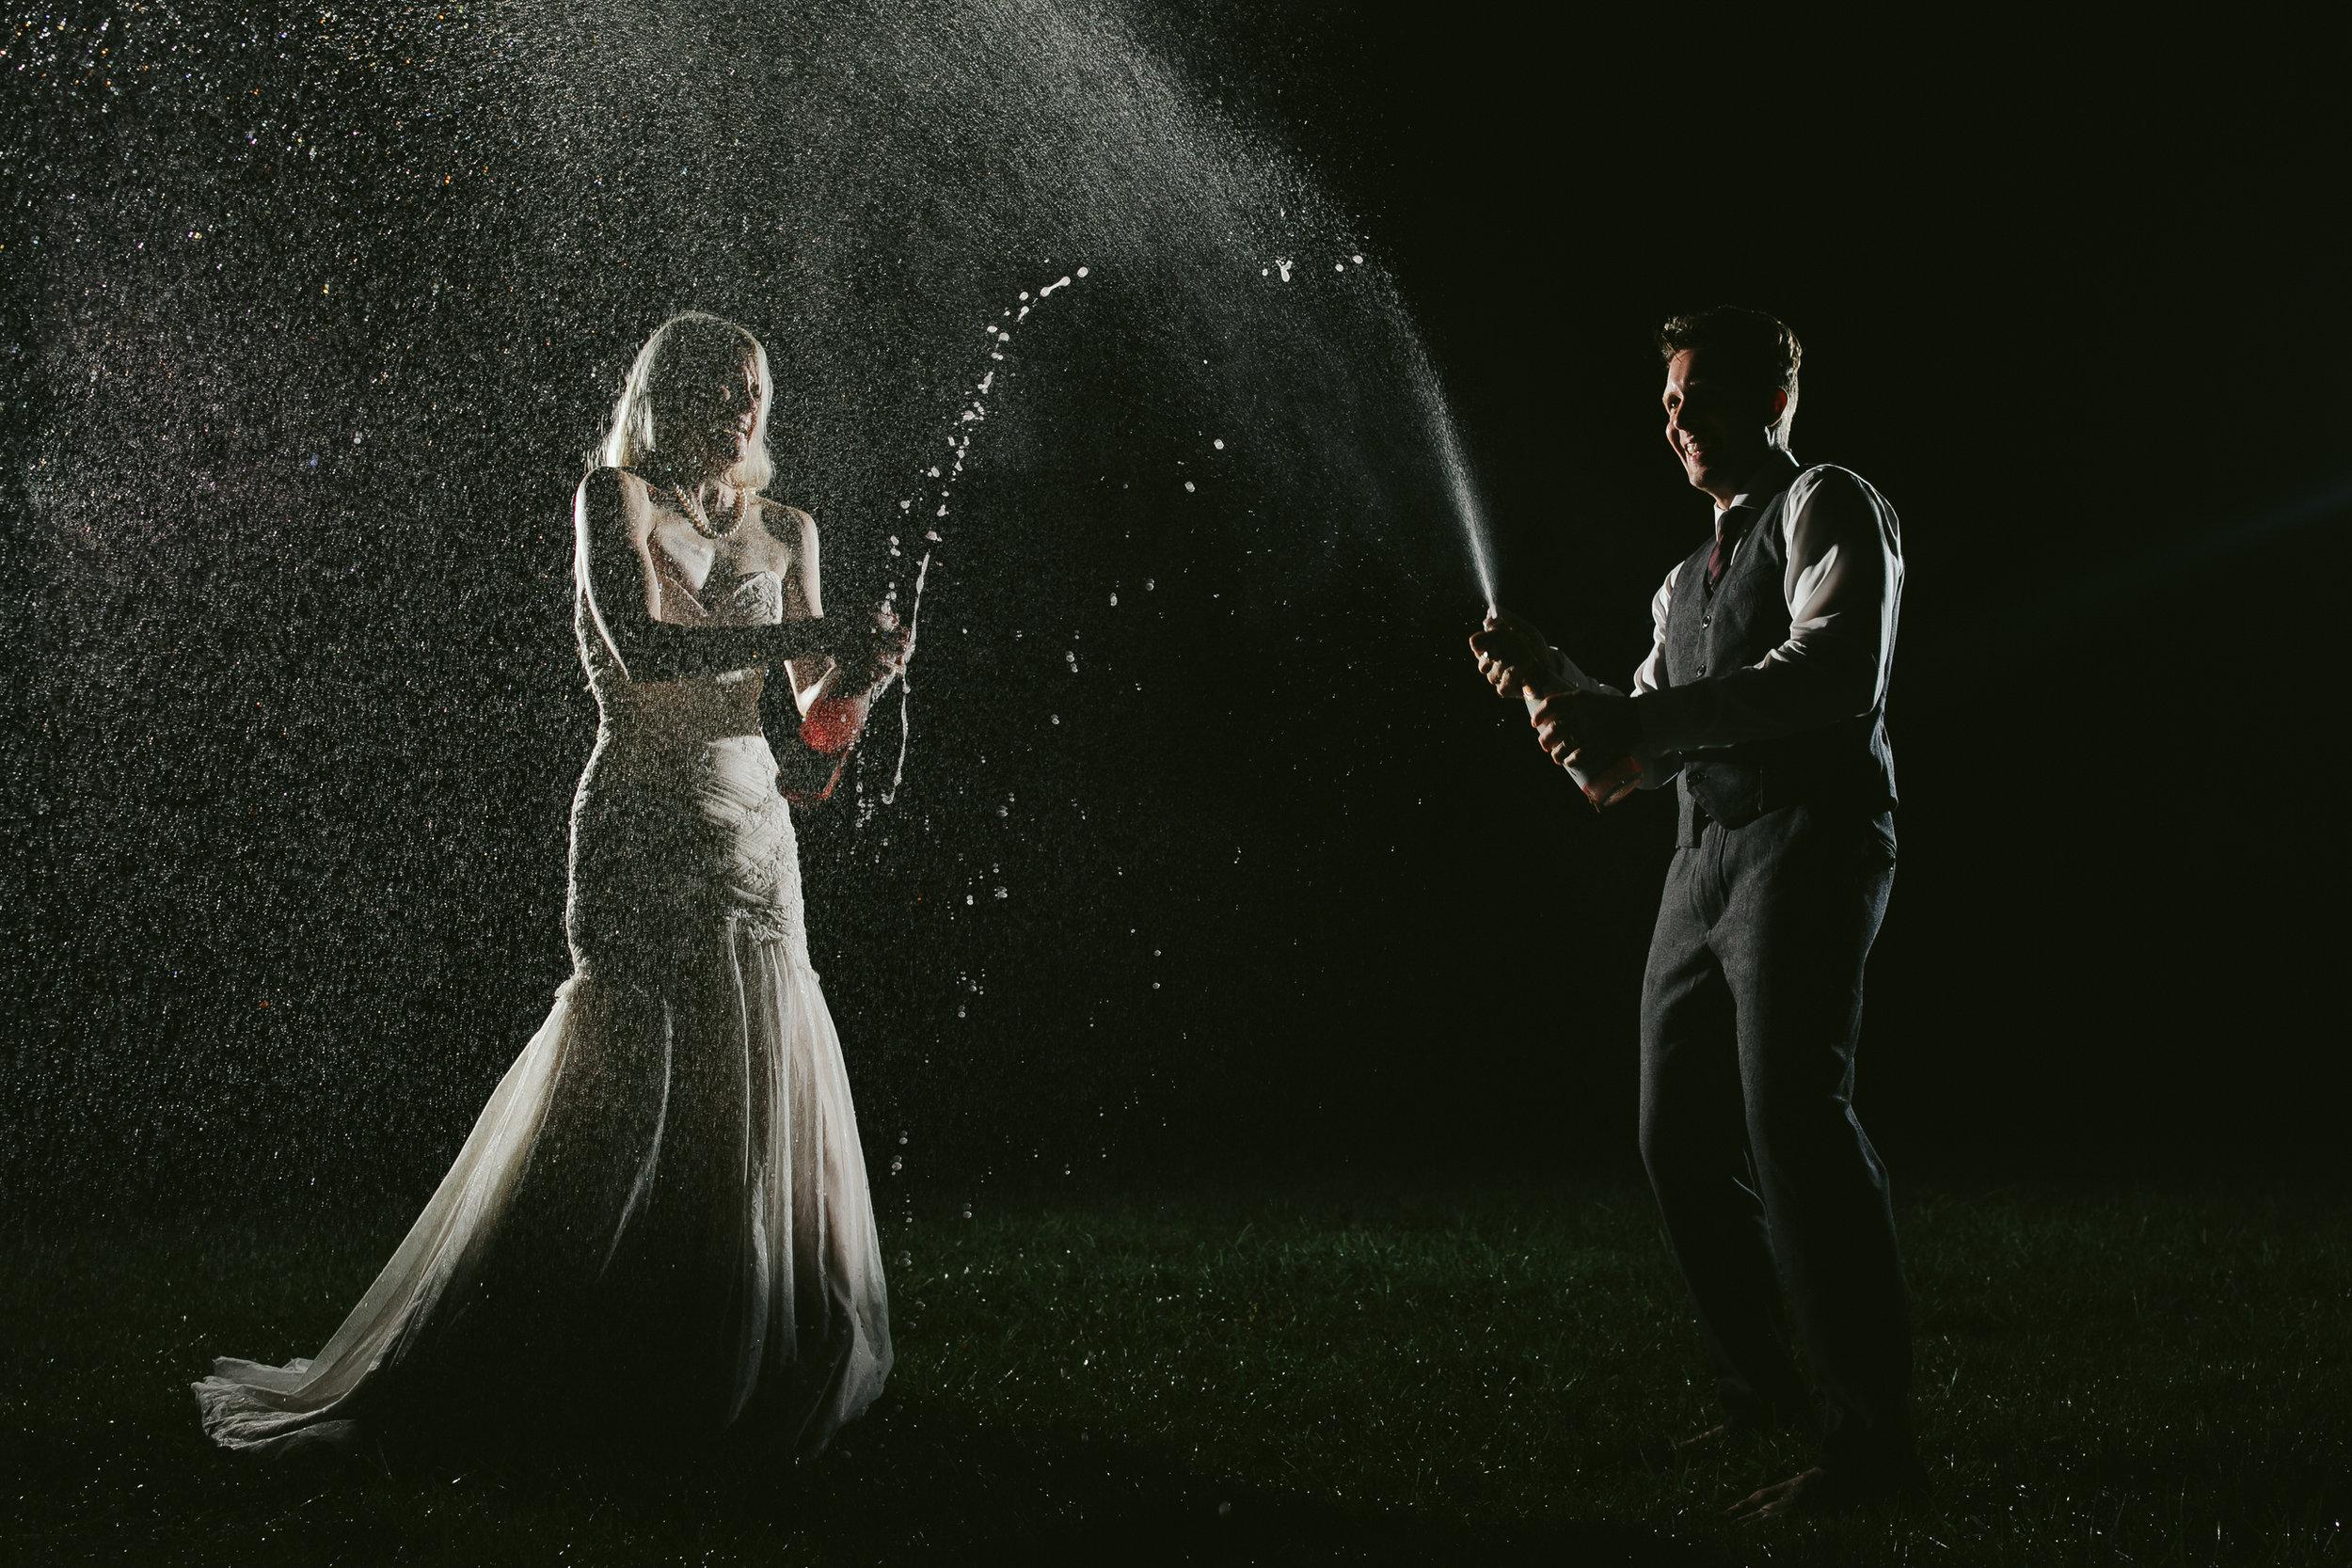 Champagne Spray Bride and Groom-3.jpg